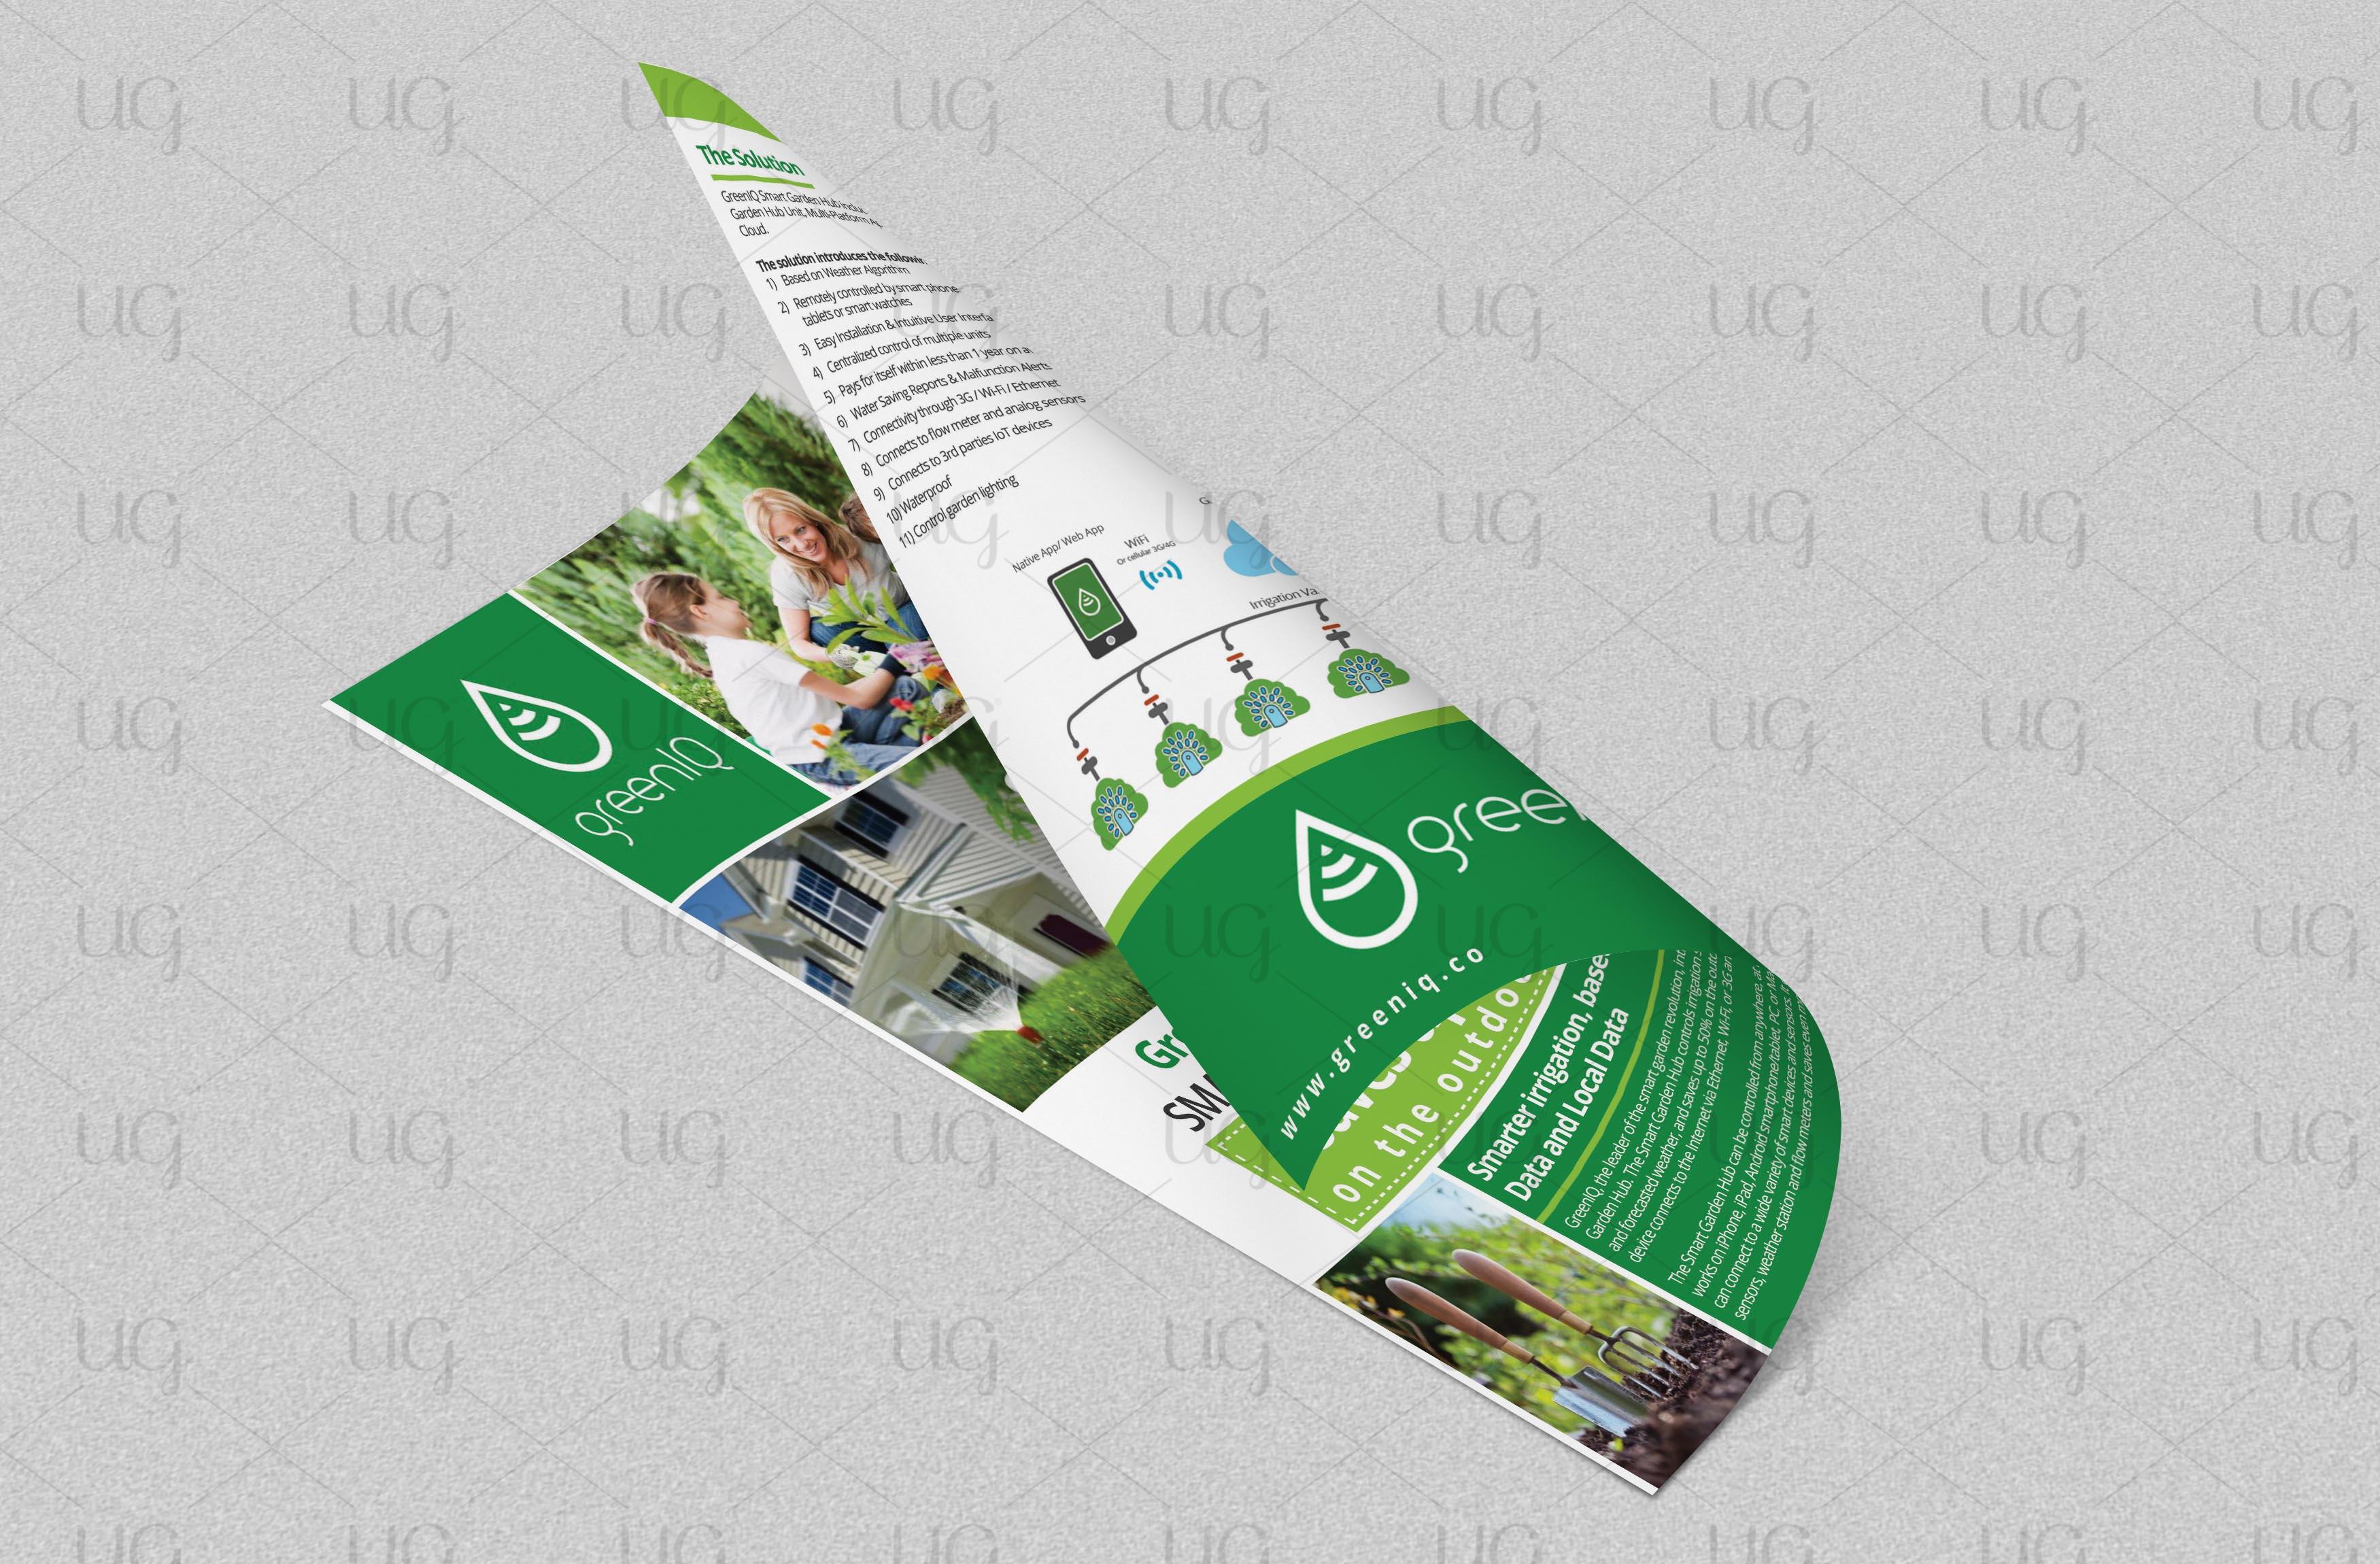 Green IQ flyer final look by ug3